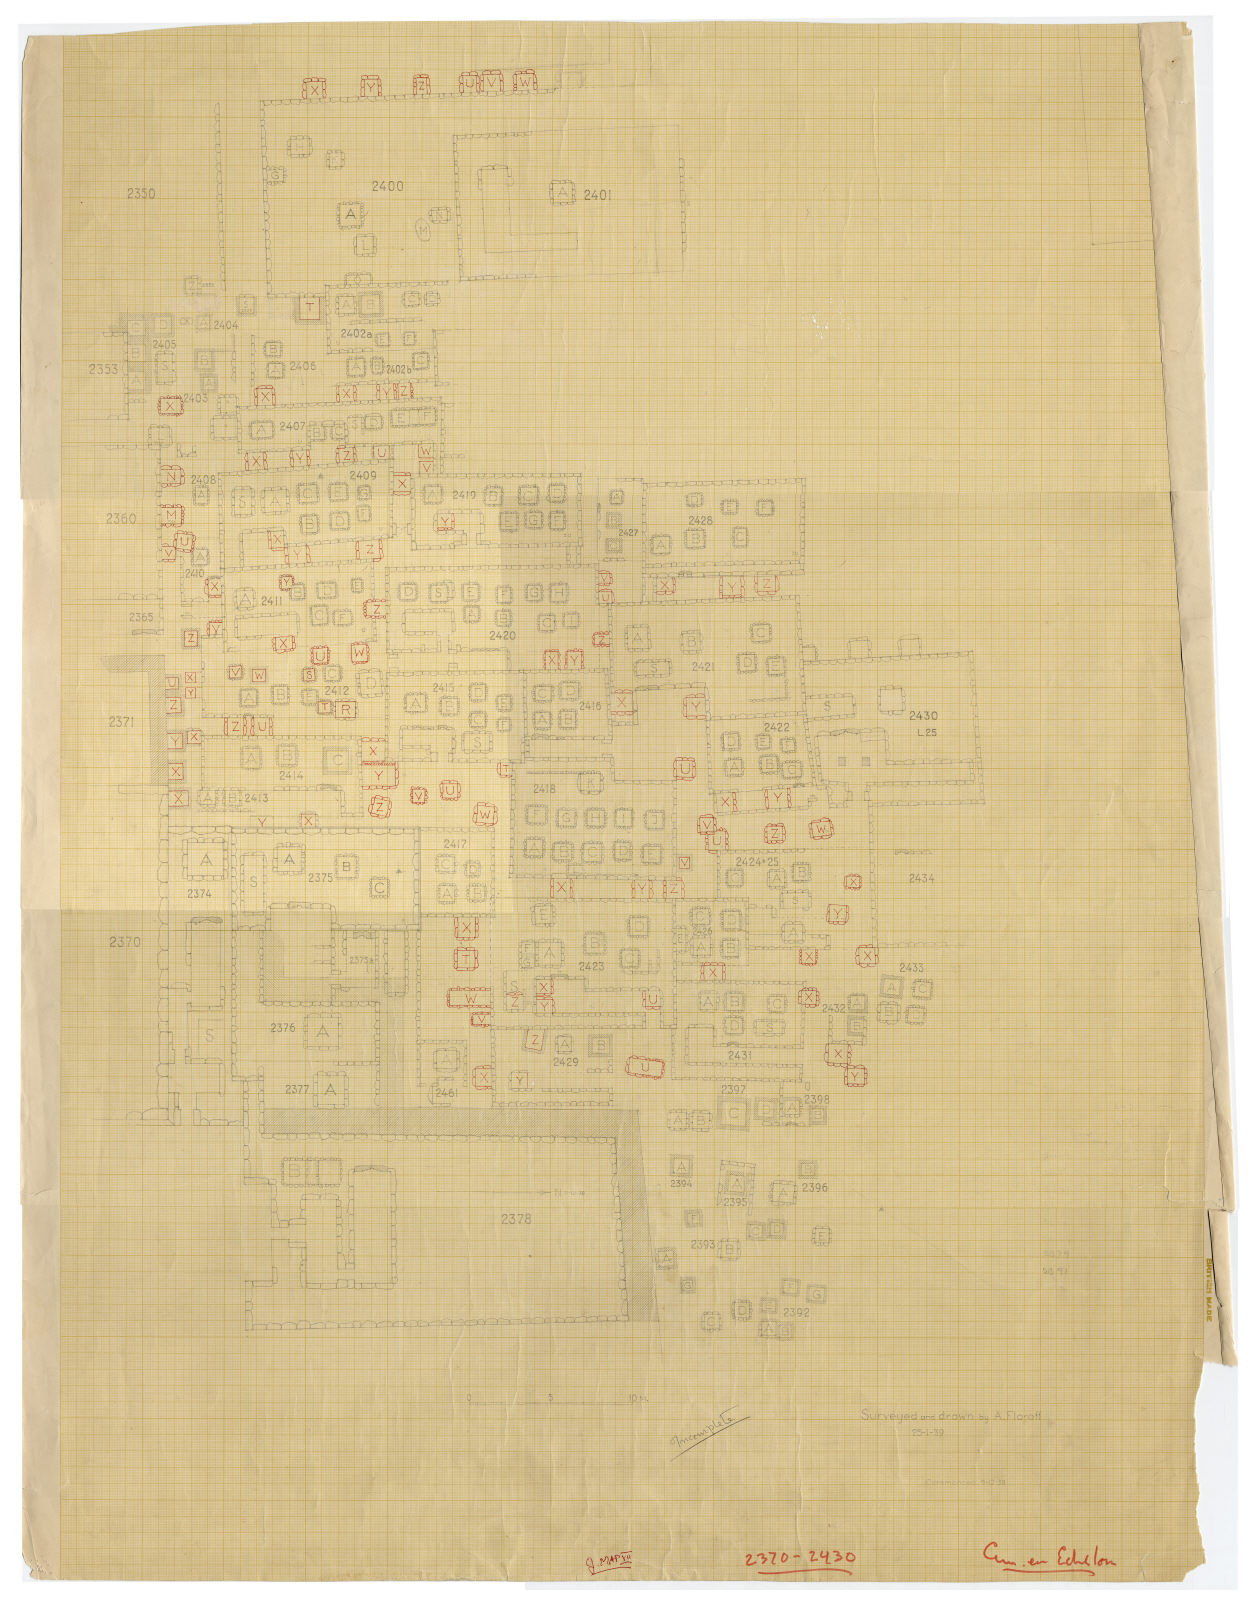 Maps and plans: Plan of Cemetery En Echelon